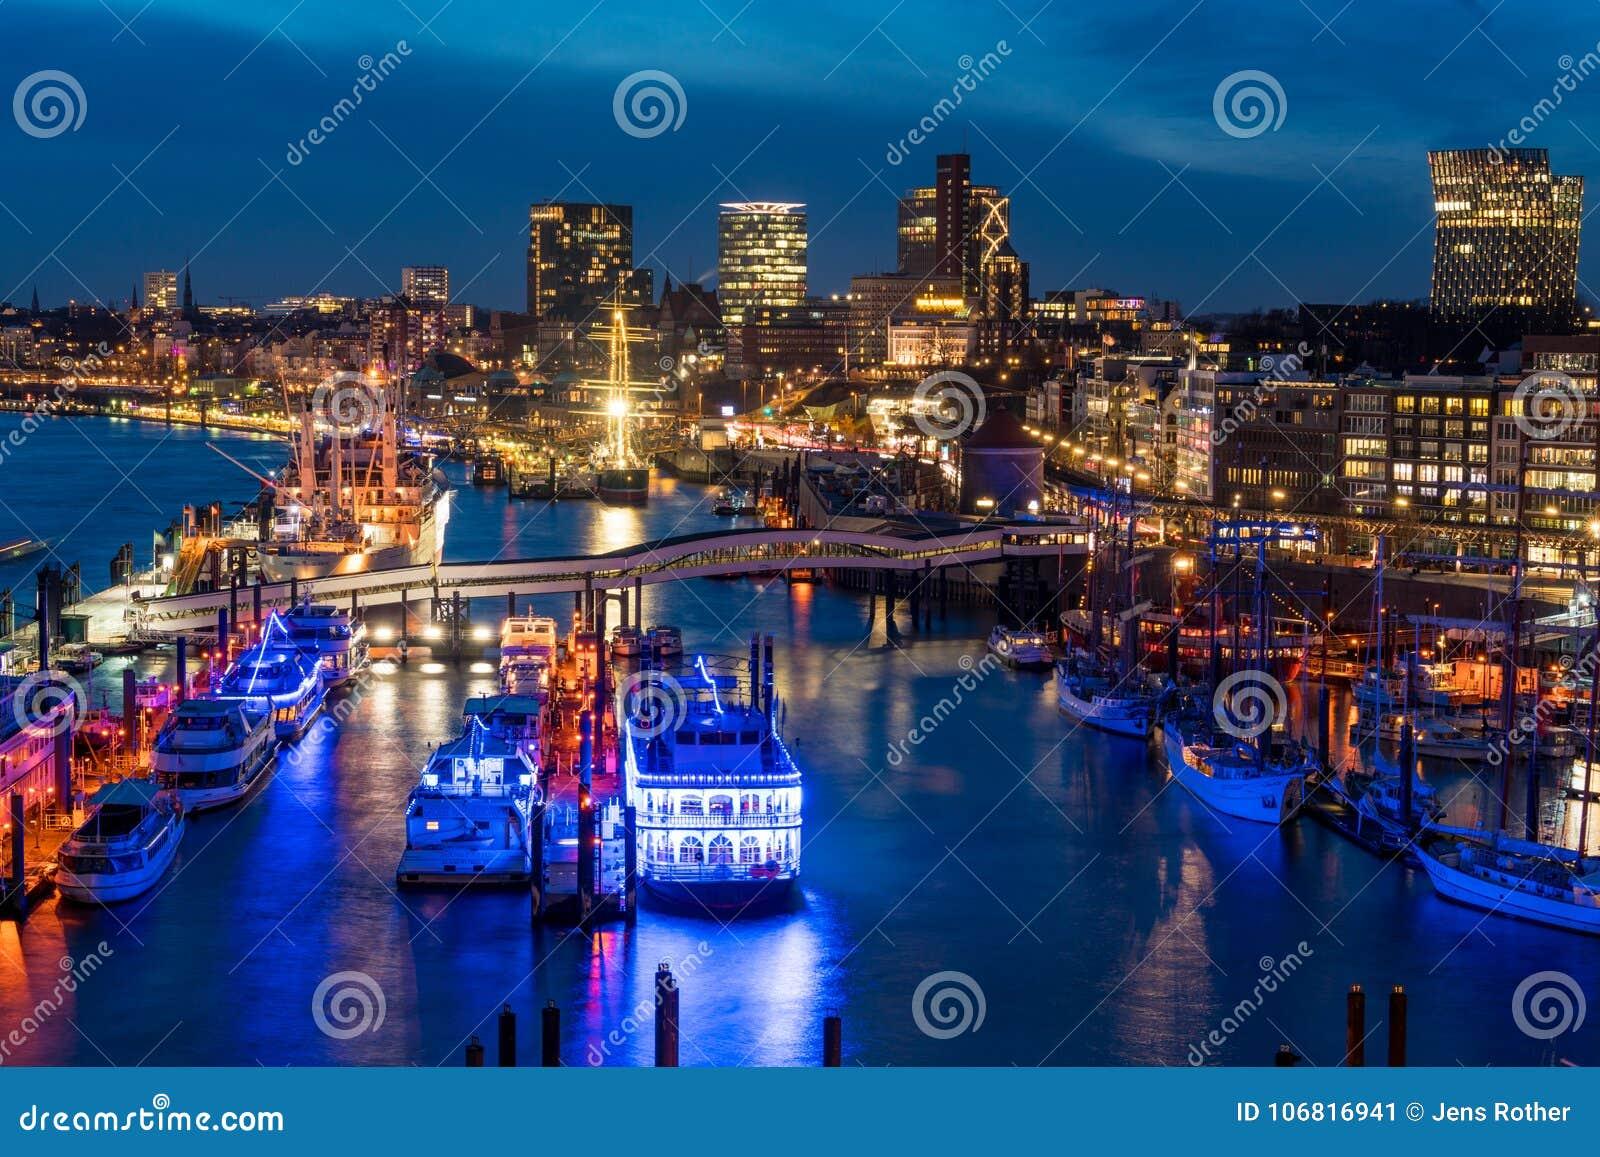 Hamburg harbor at nighttime from above